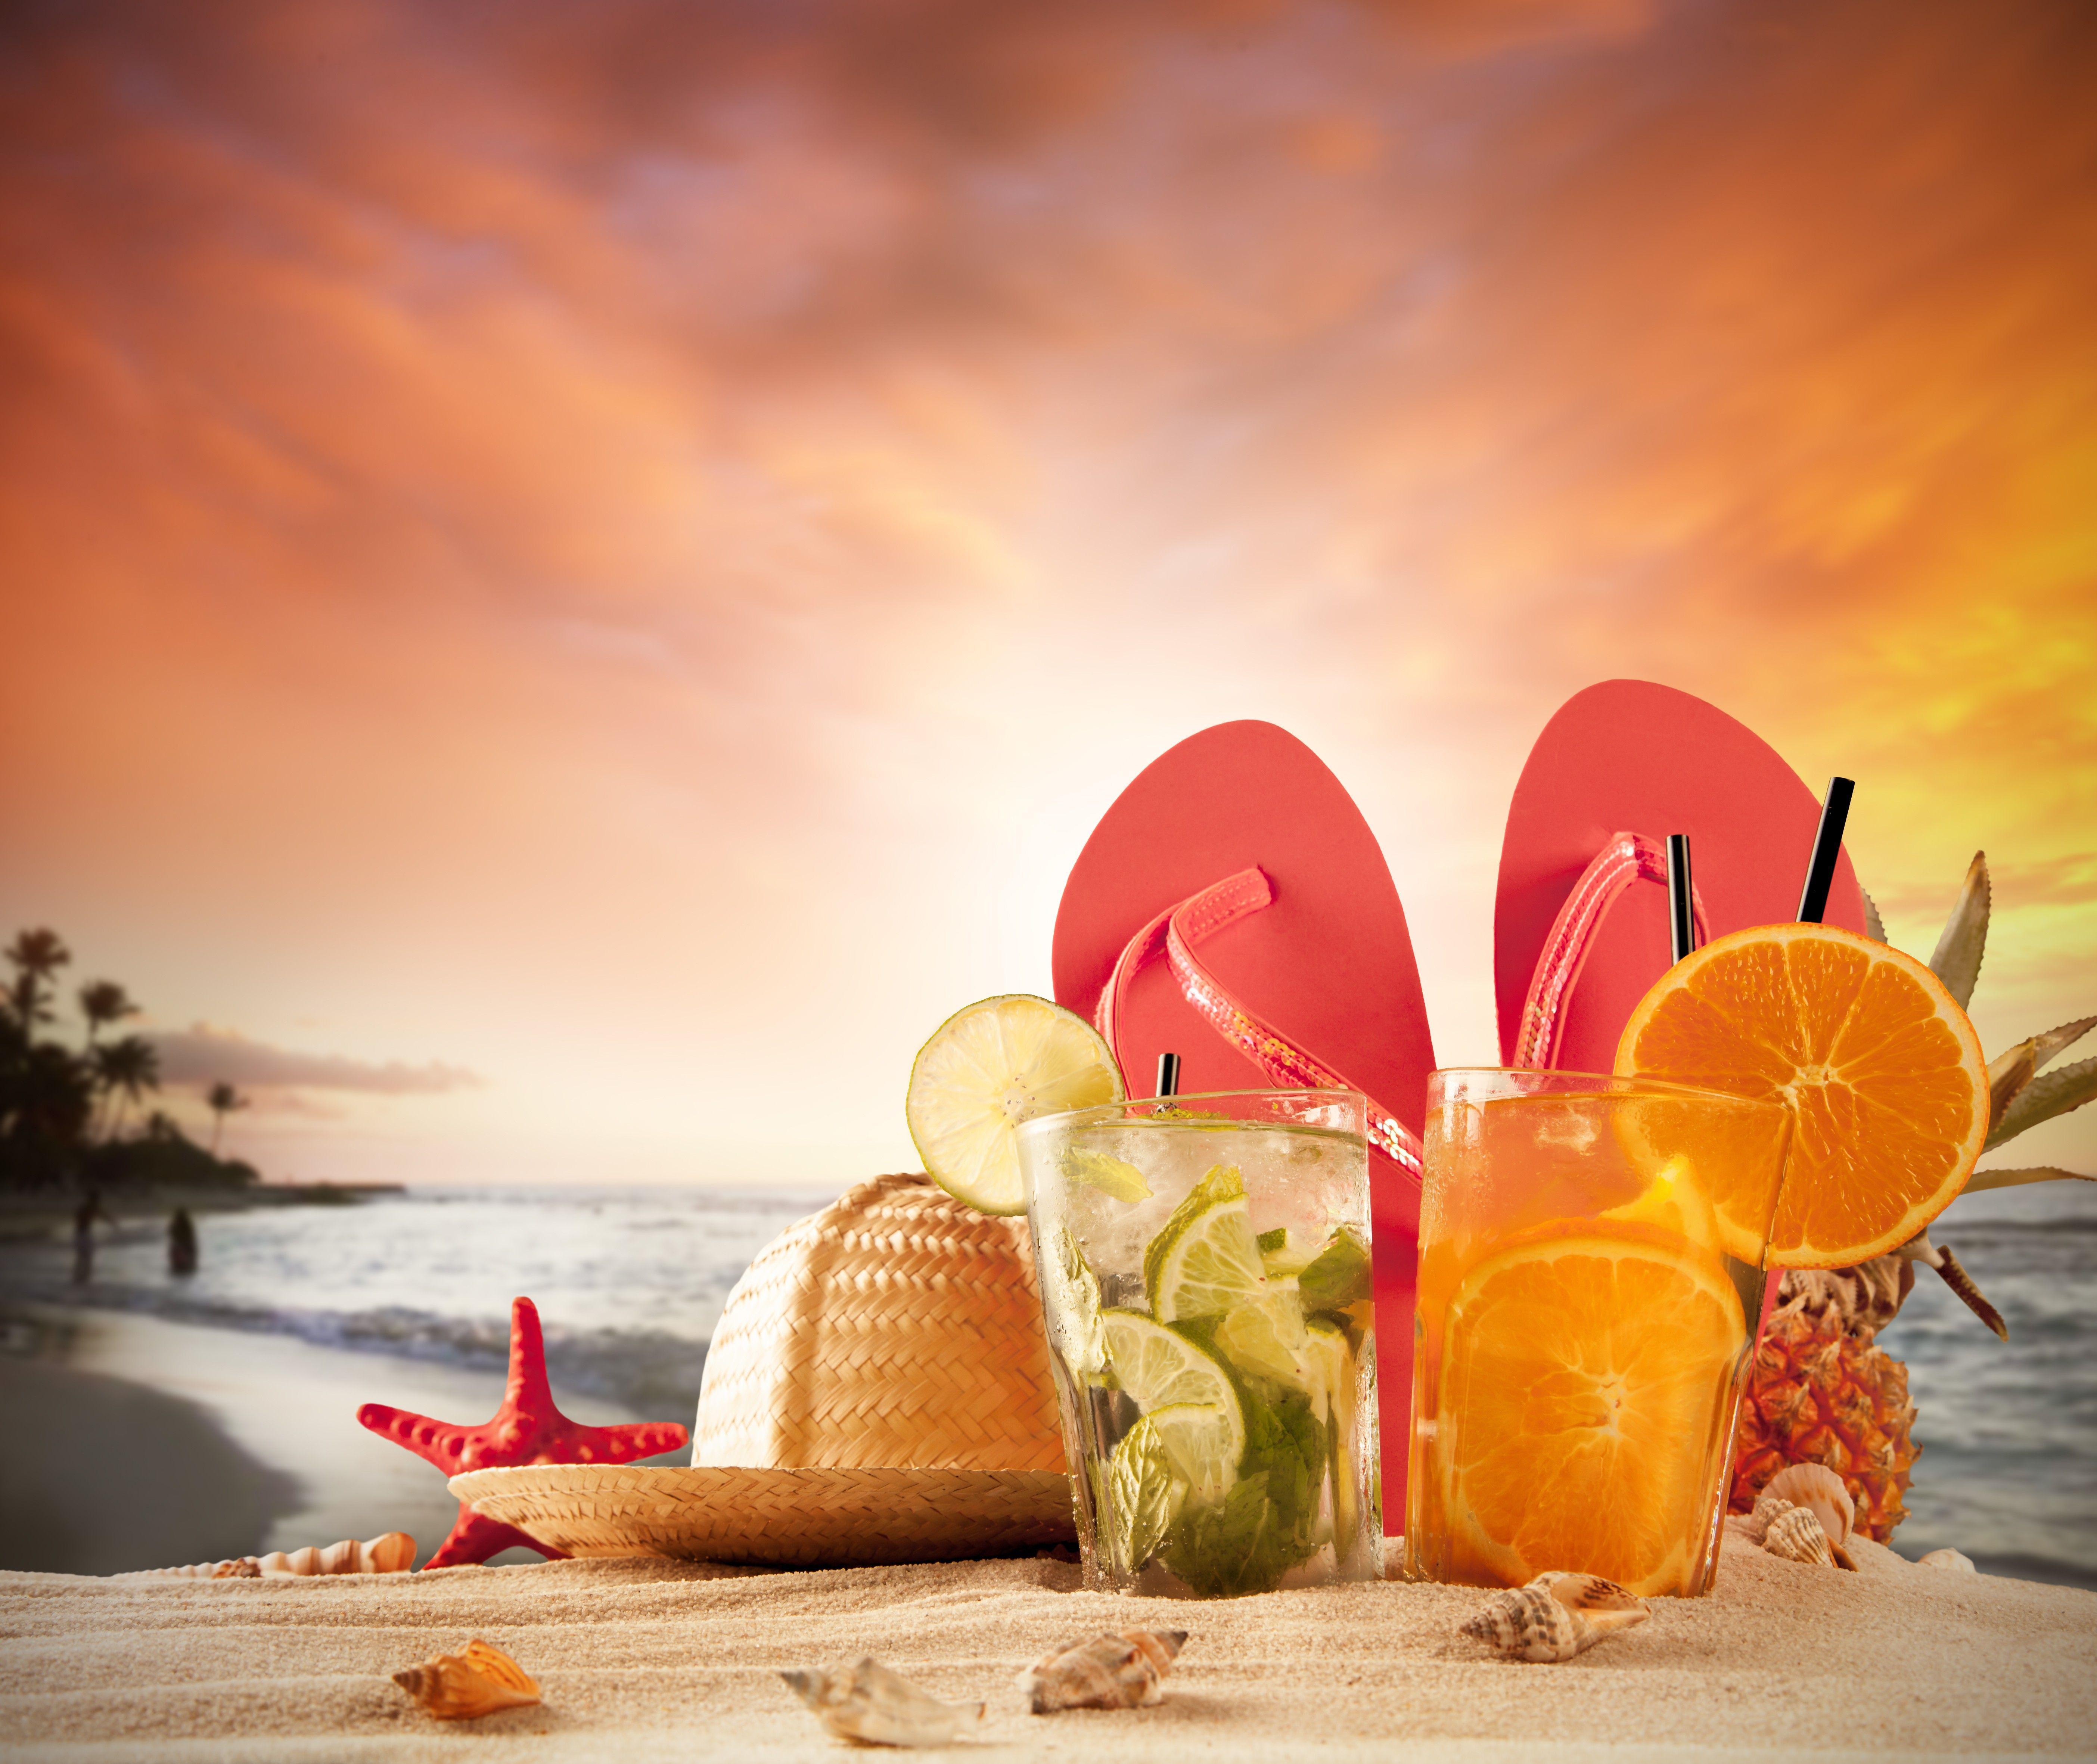 Summer Drinks Wallpapers